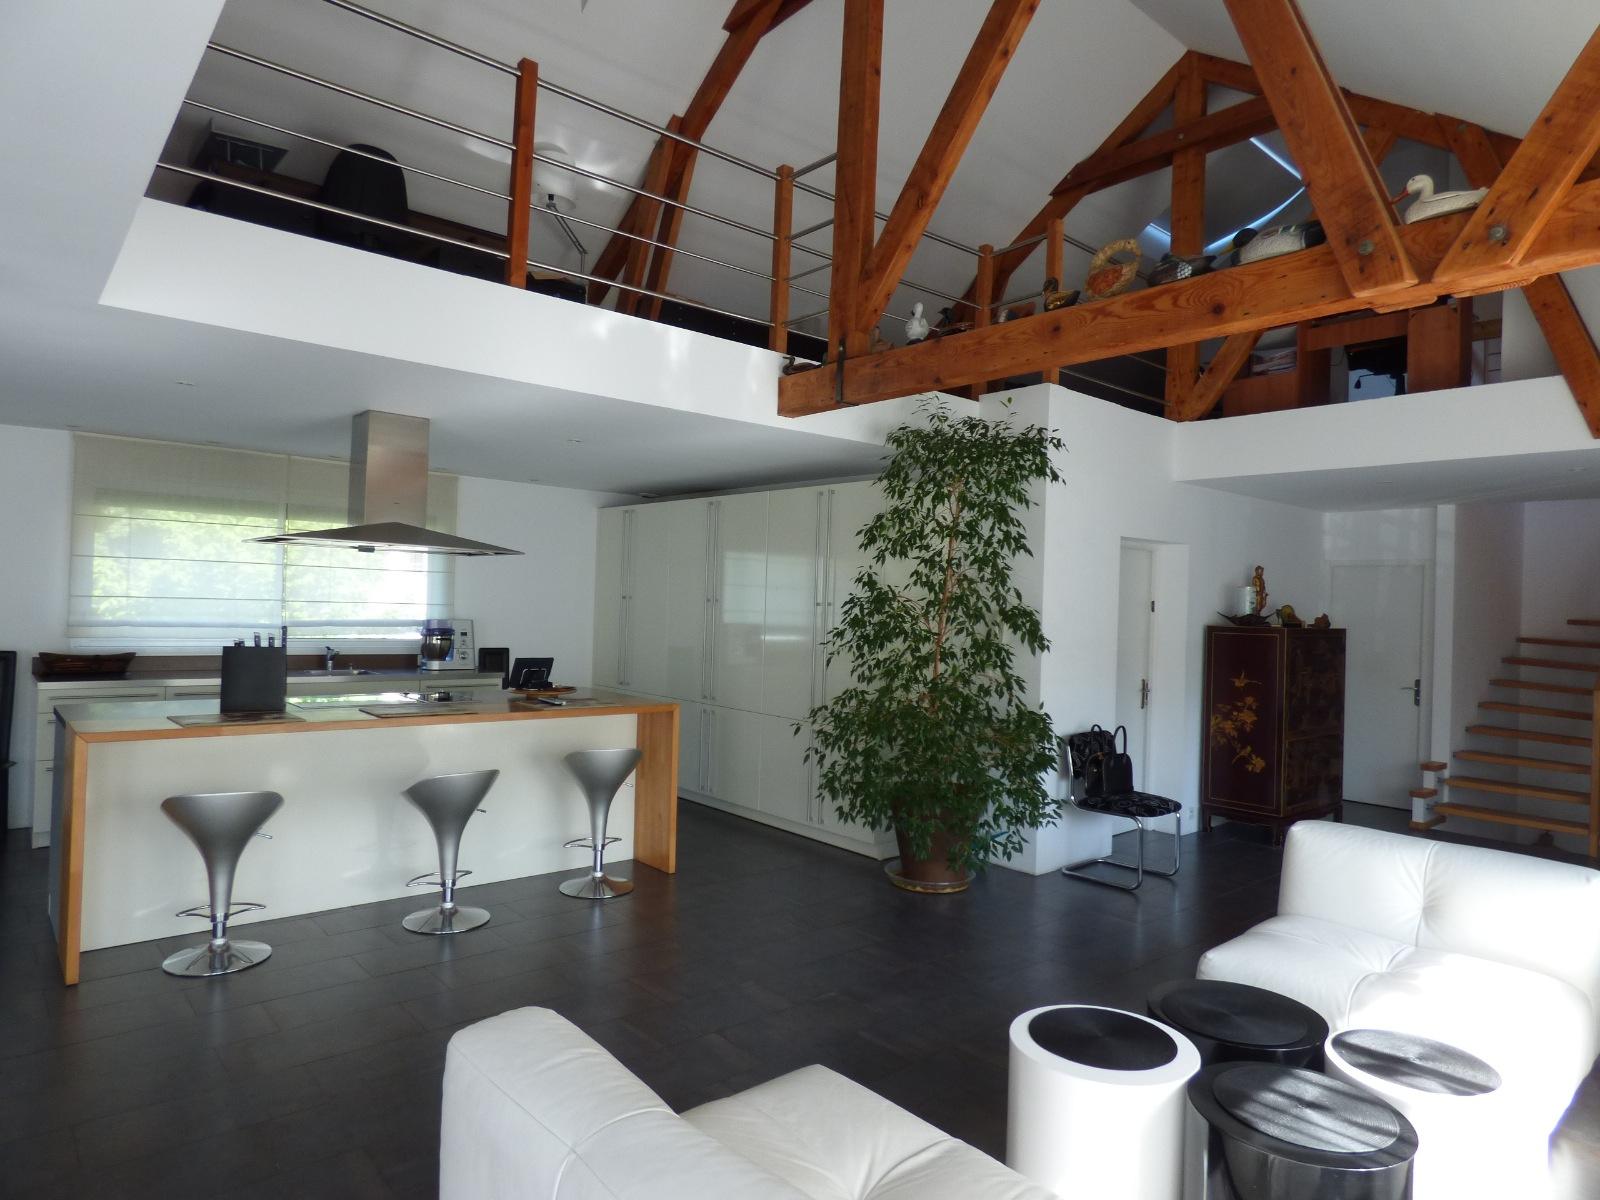 annonce appartement rodez vente. Black Bedroom Furniture Sets. Home Design Ideas